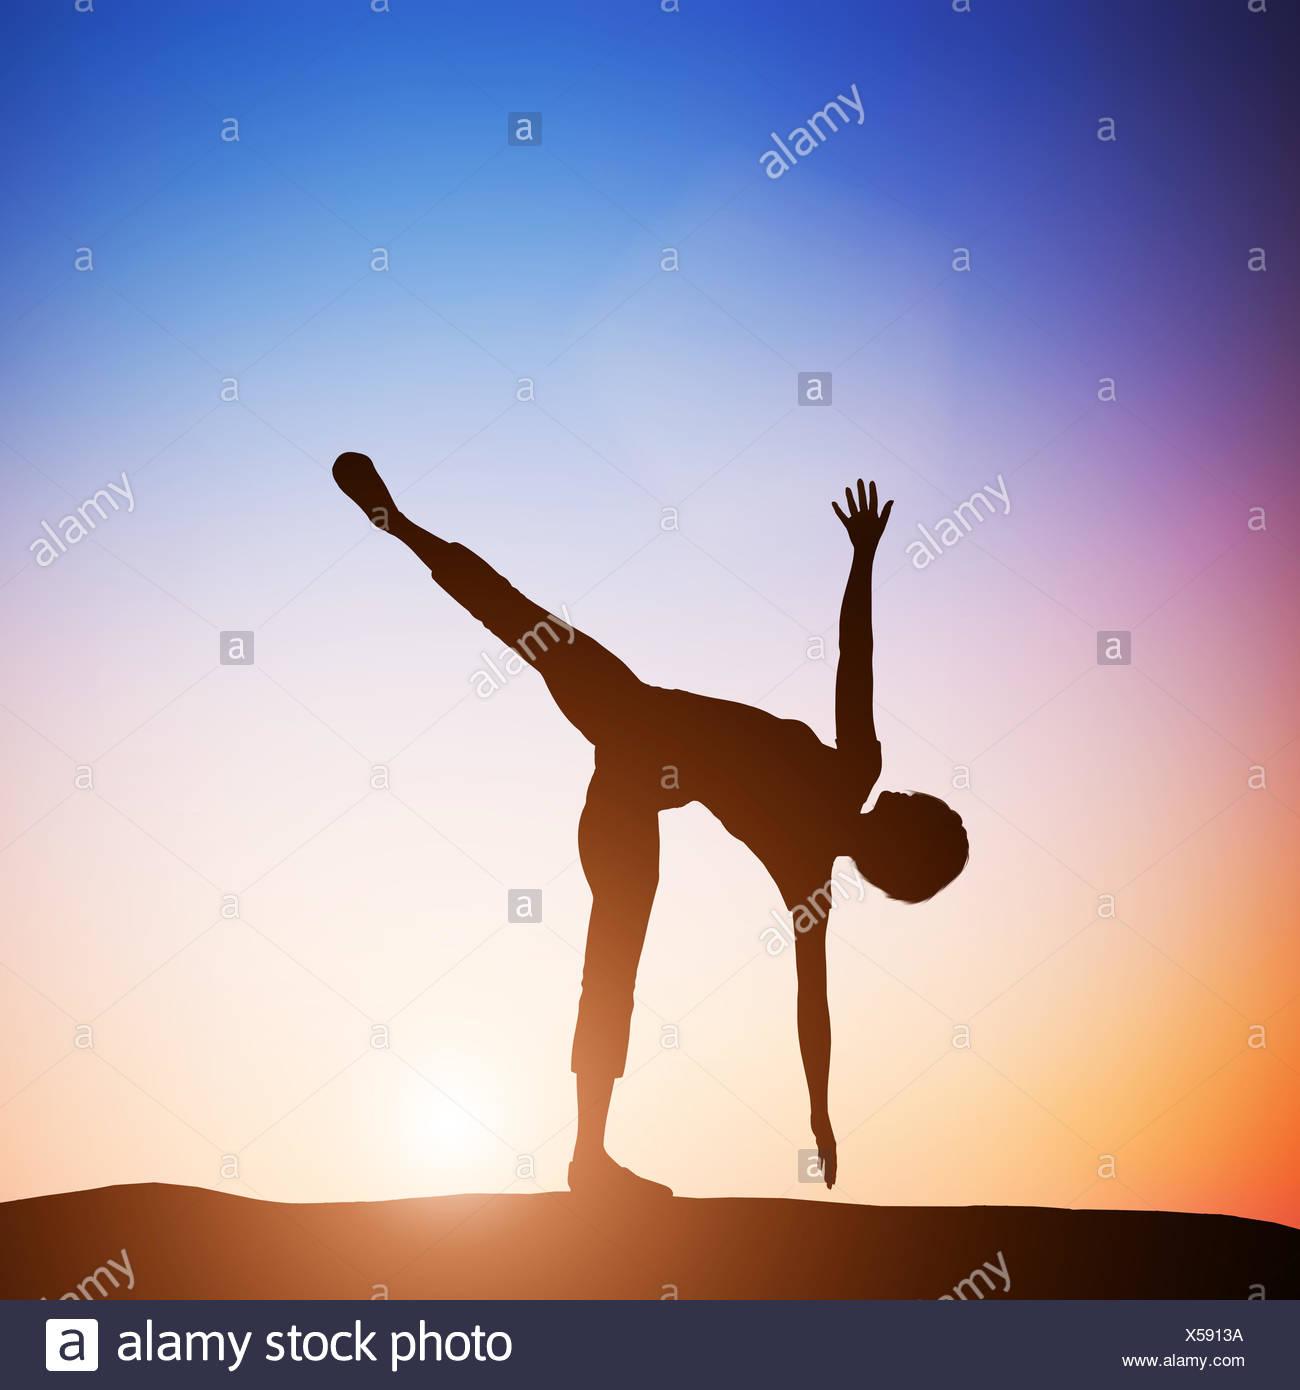 Woman in half moon yoga pose meditating at sunset. Zen - Stock Image